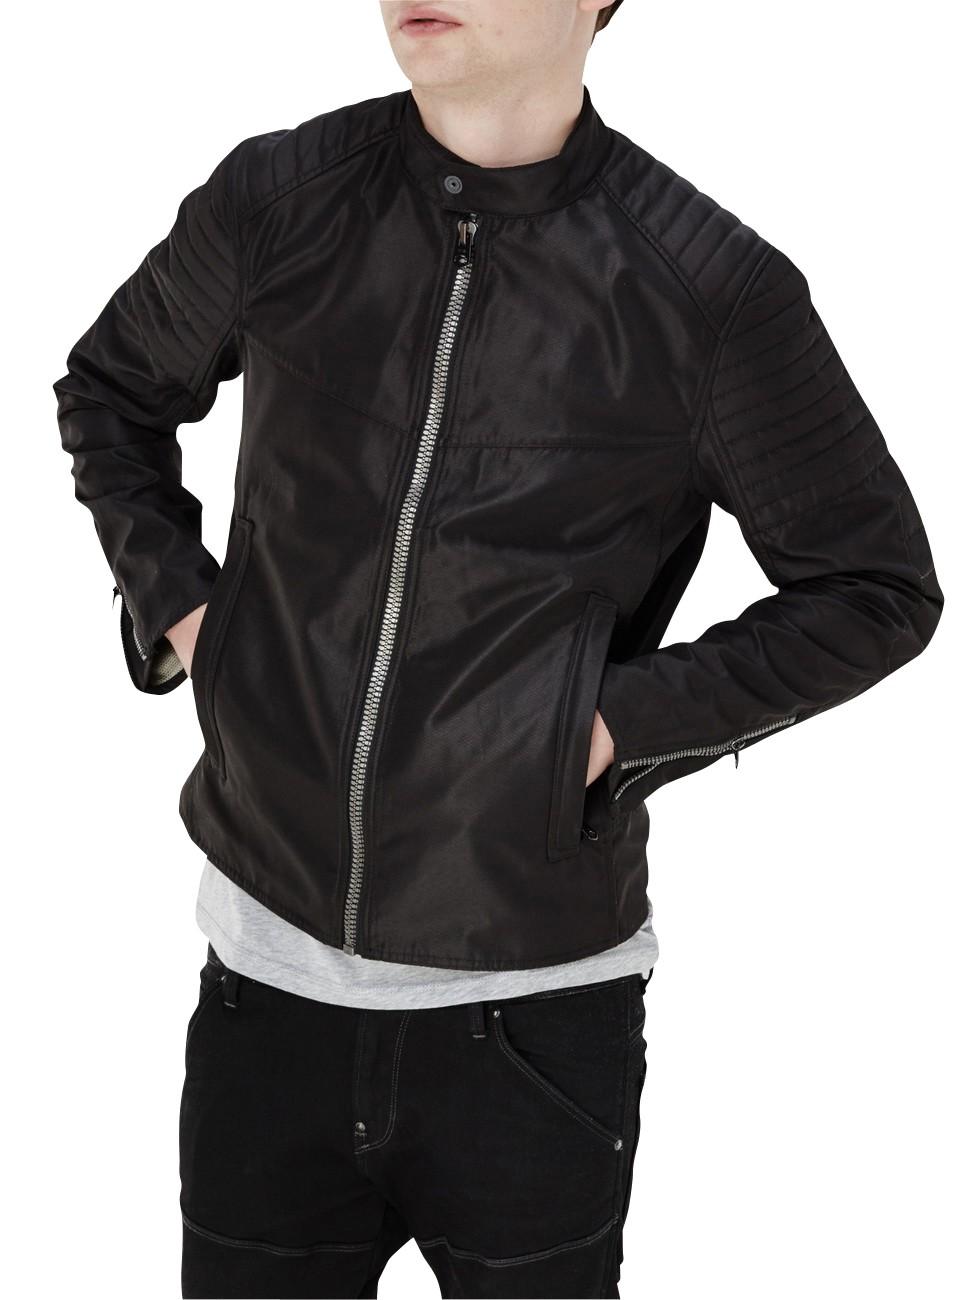 g star herren jacke attacc gp kaufen jeans direct de. Black Bedroom Furniture Sets. Home Design Ideas